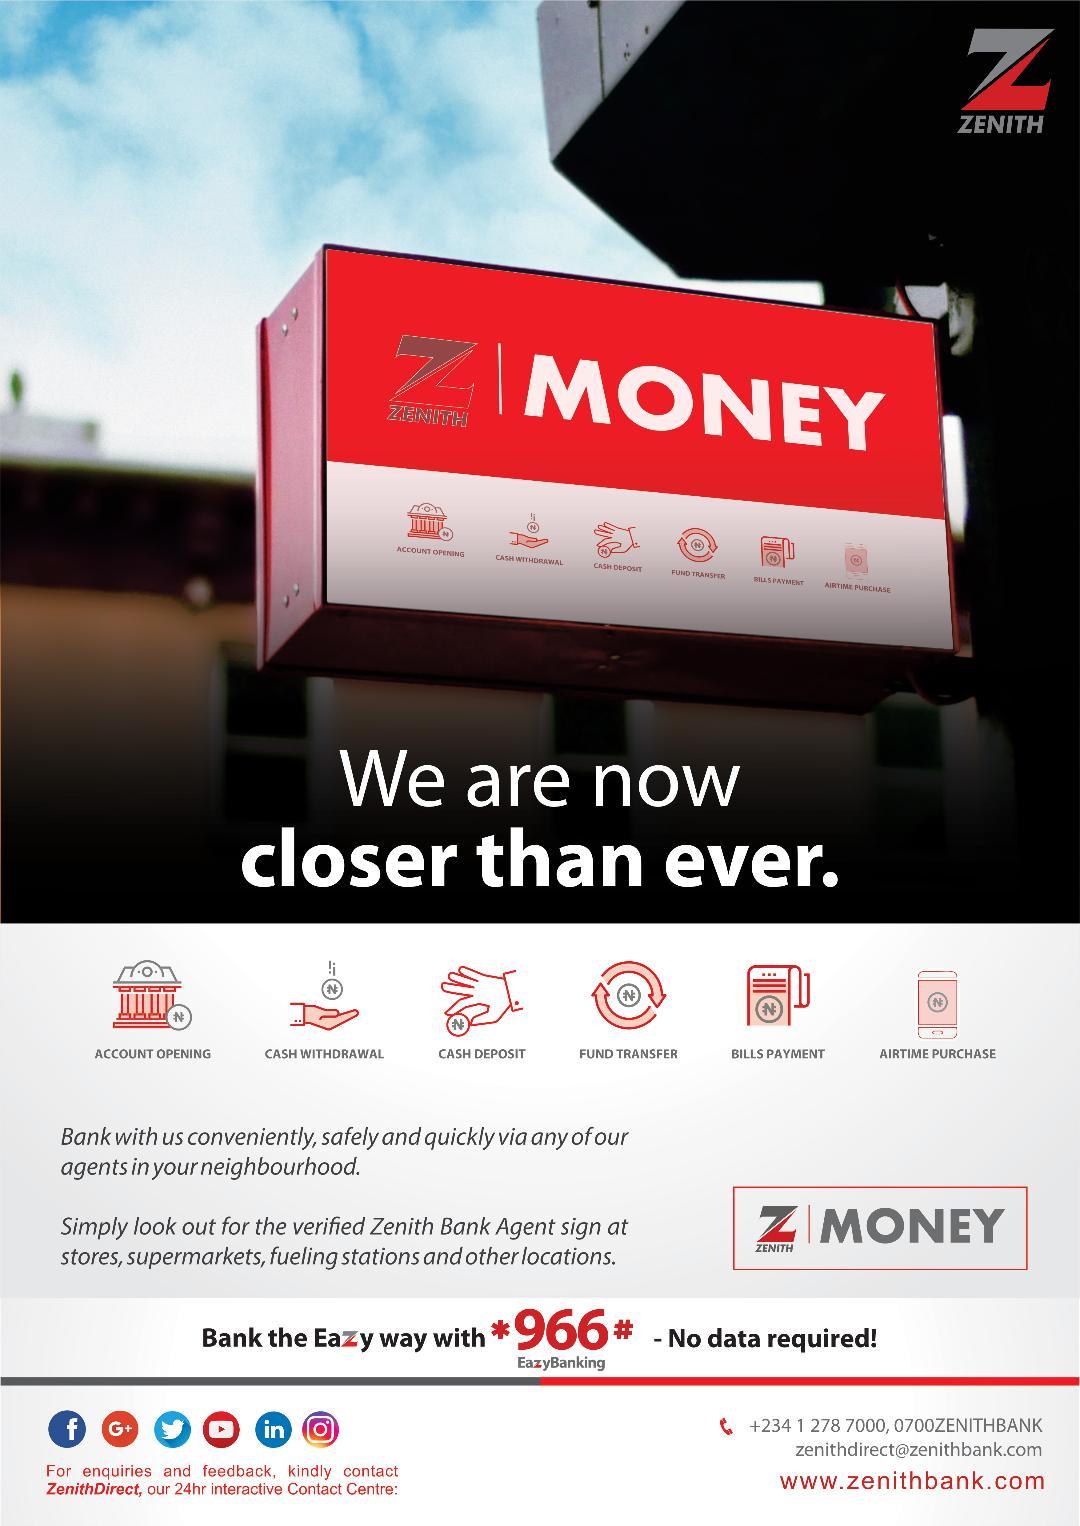 Z-Money: Zenith Bank drives convenient banking, financial inclusion